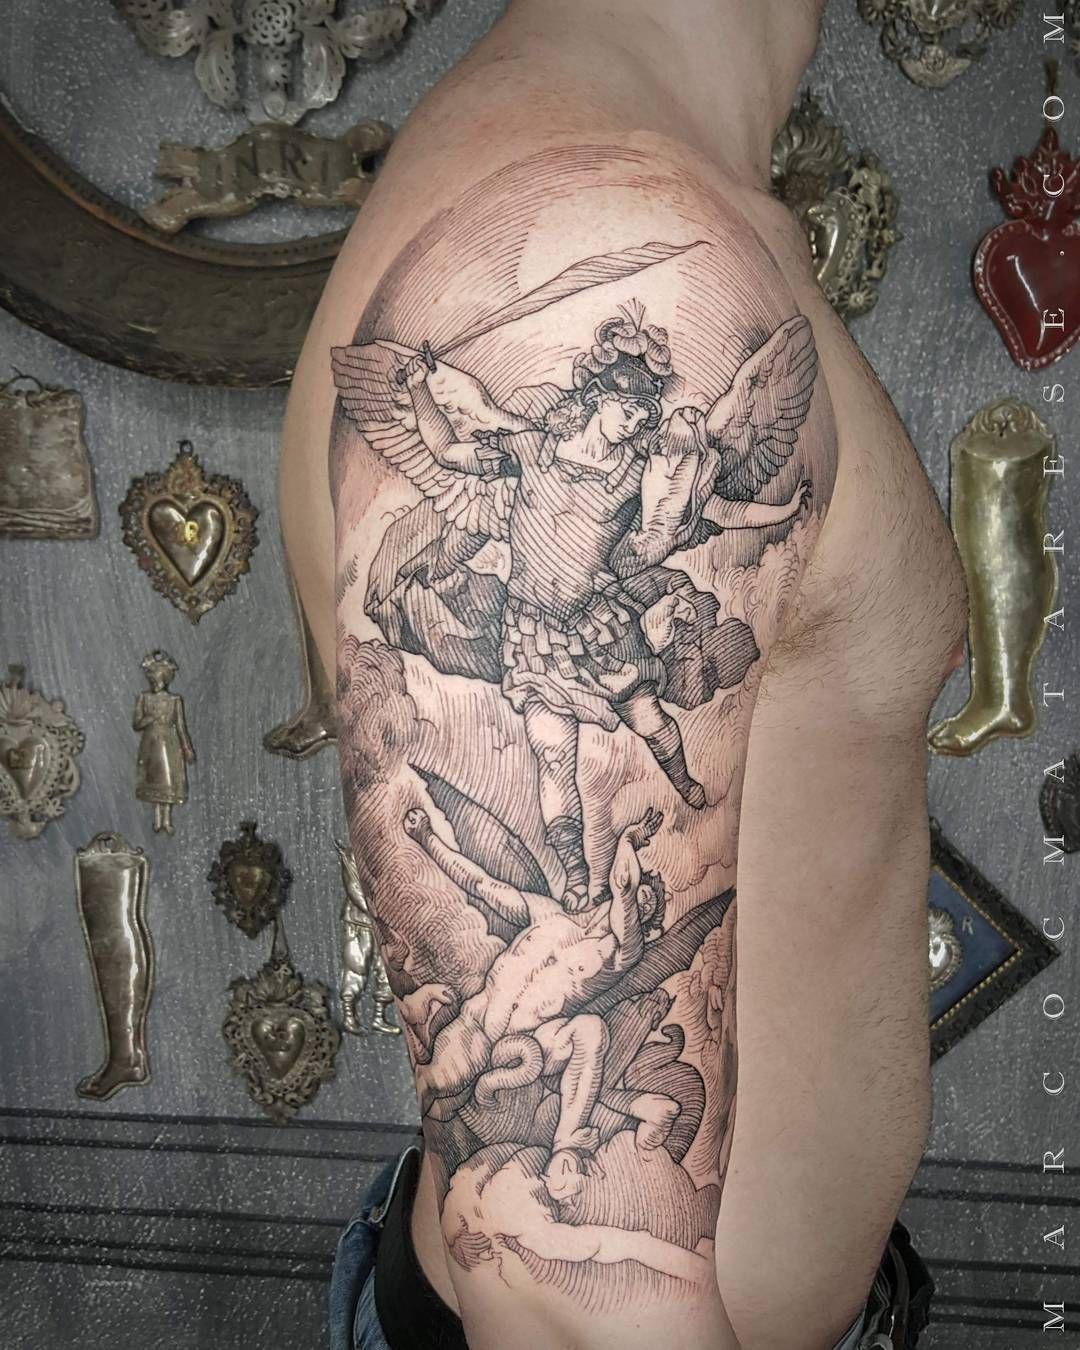 dc47d4692 #purotattoostudio #marcocmatarese #matarese #incisione #etching #engraving  #drawing #lines #blackwork #milano #milan #tatuage #ink #tattoo #tattooist  #nero ...